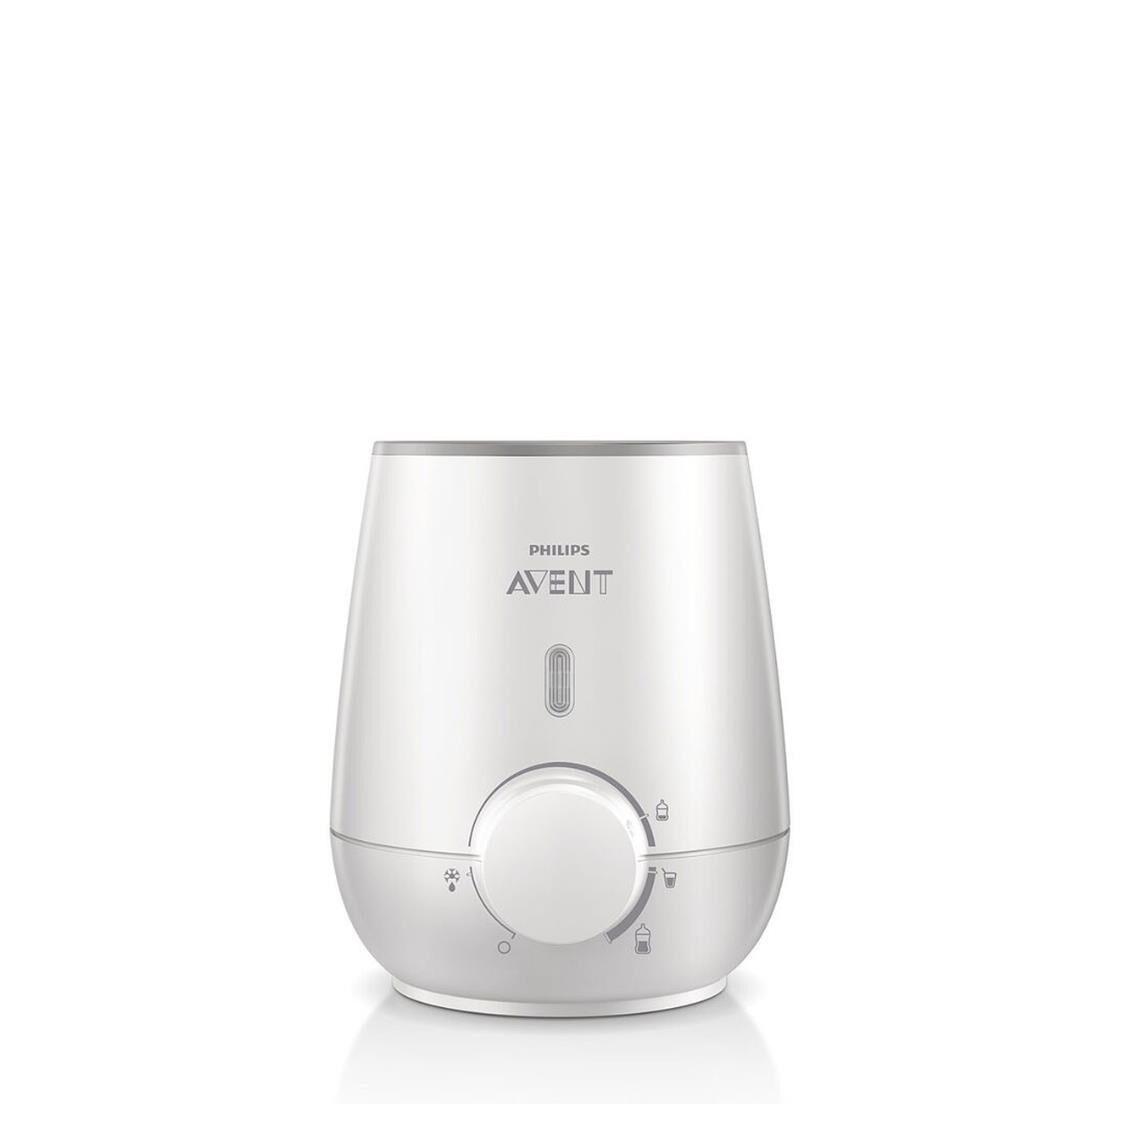 Philips Avent Electric Milk Warmer